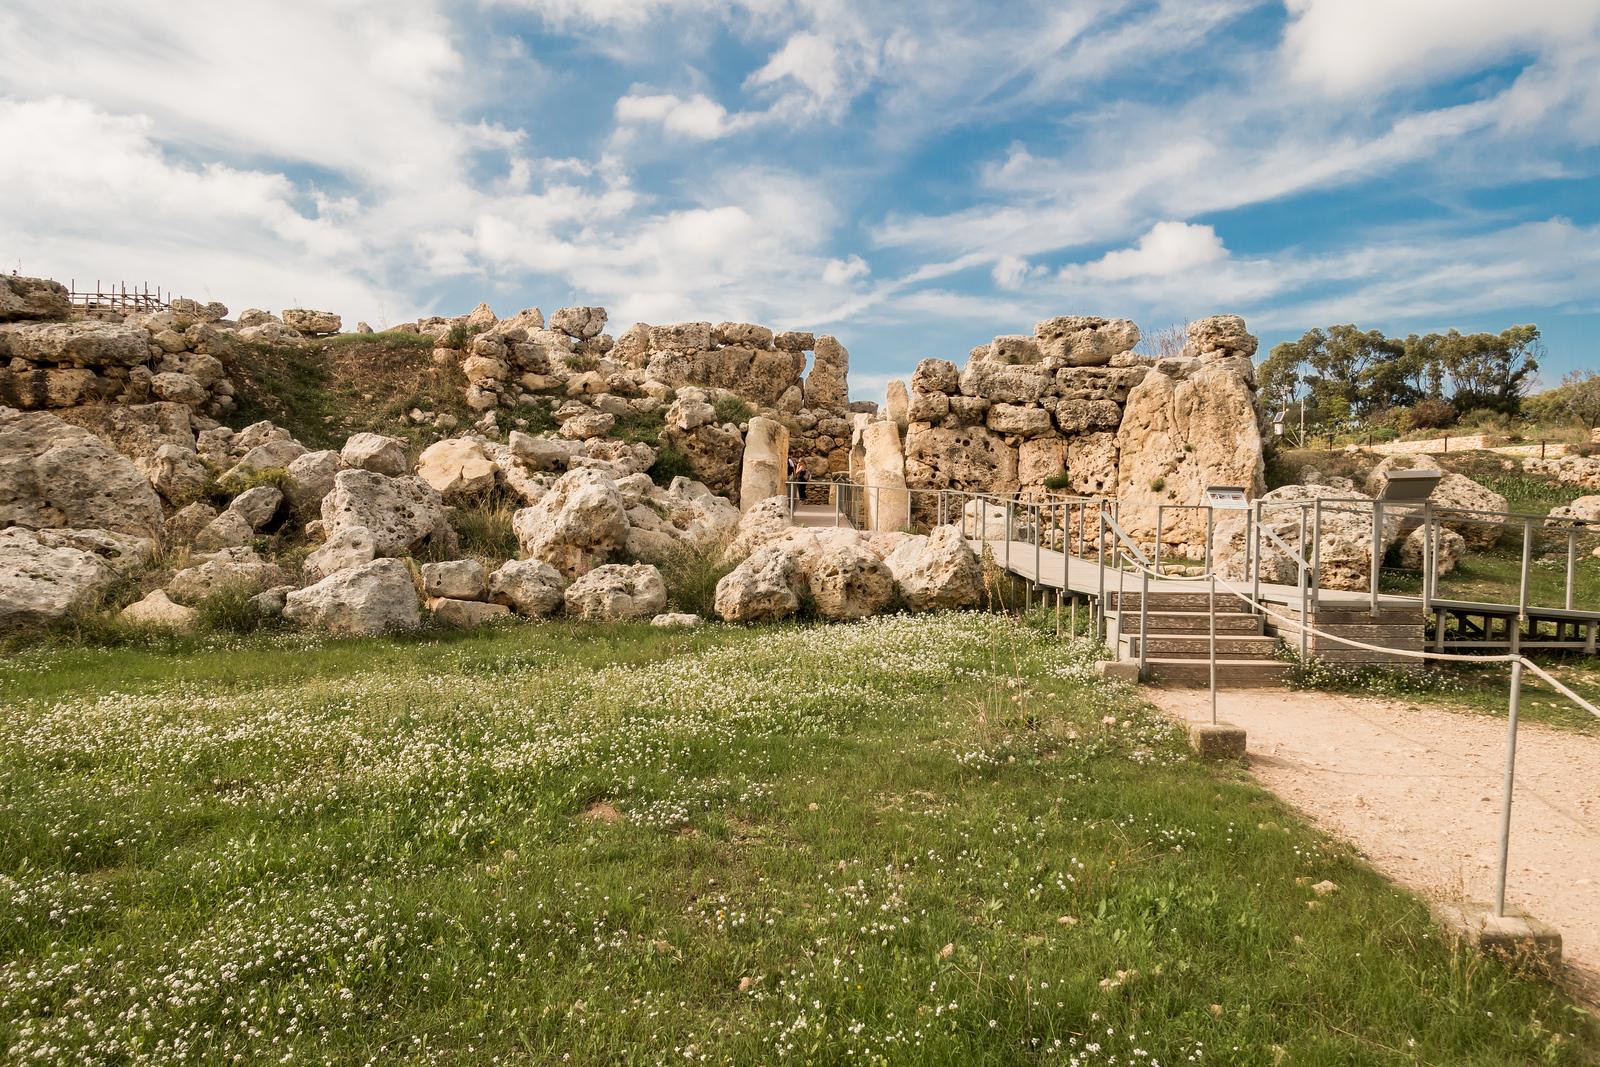 Malta Pictures - Prehistoric monuments in Malta